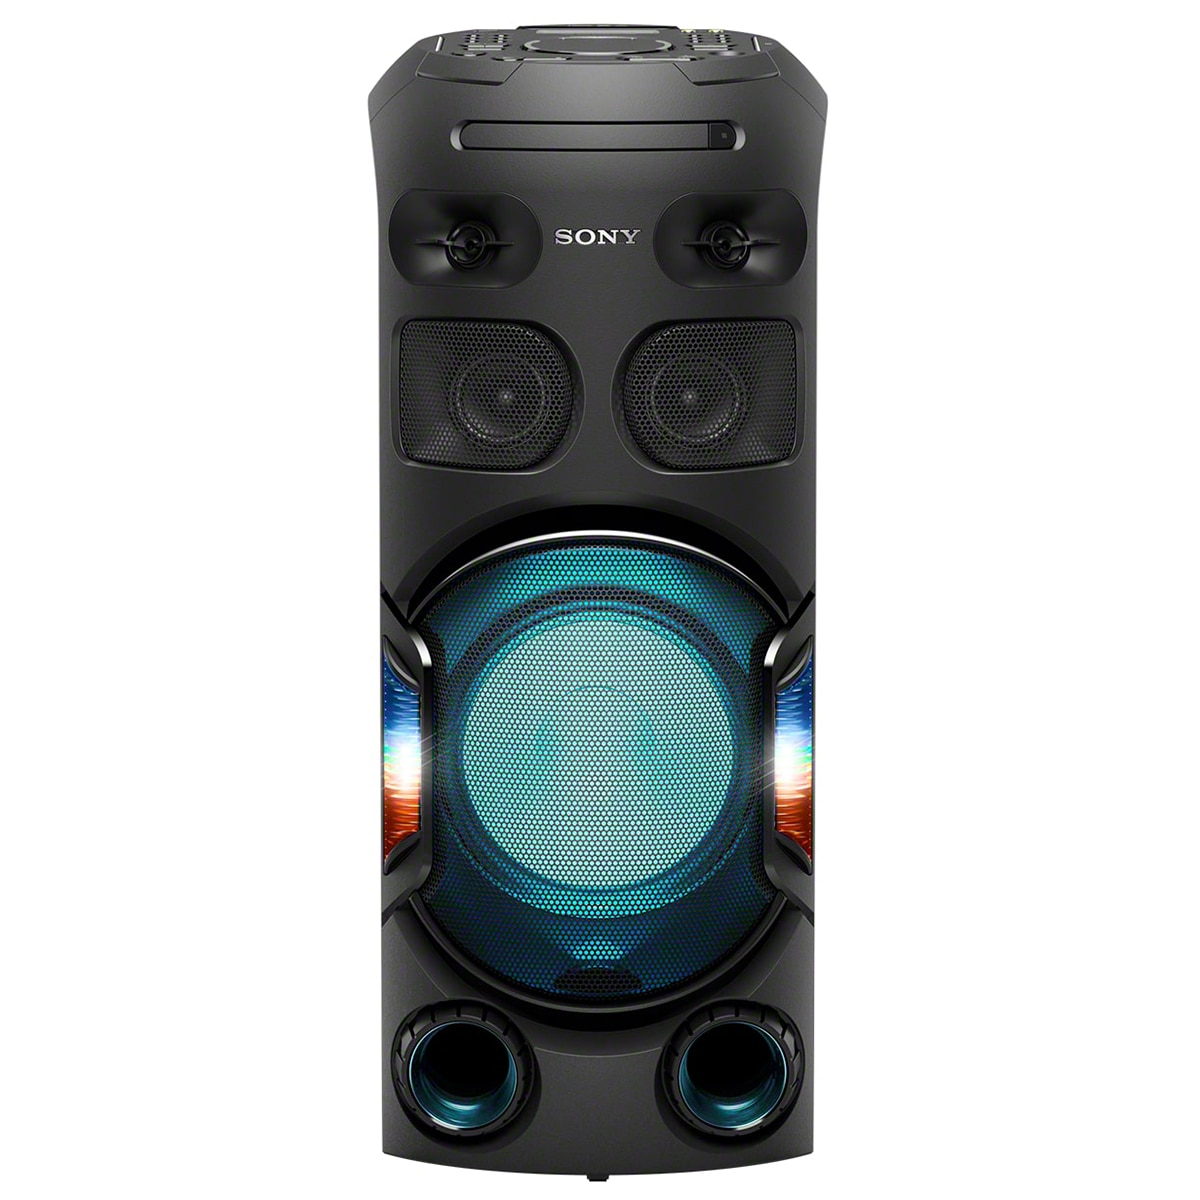 Fotografie Sistem audio High Power SONY MHC-V42D, Jet Bass Booster, Hi-Fi, Bluetooth, NFC, Dj Effects, USB, DVD, Party music, Party lights, Negru